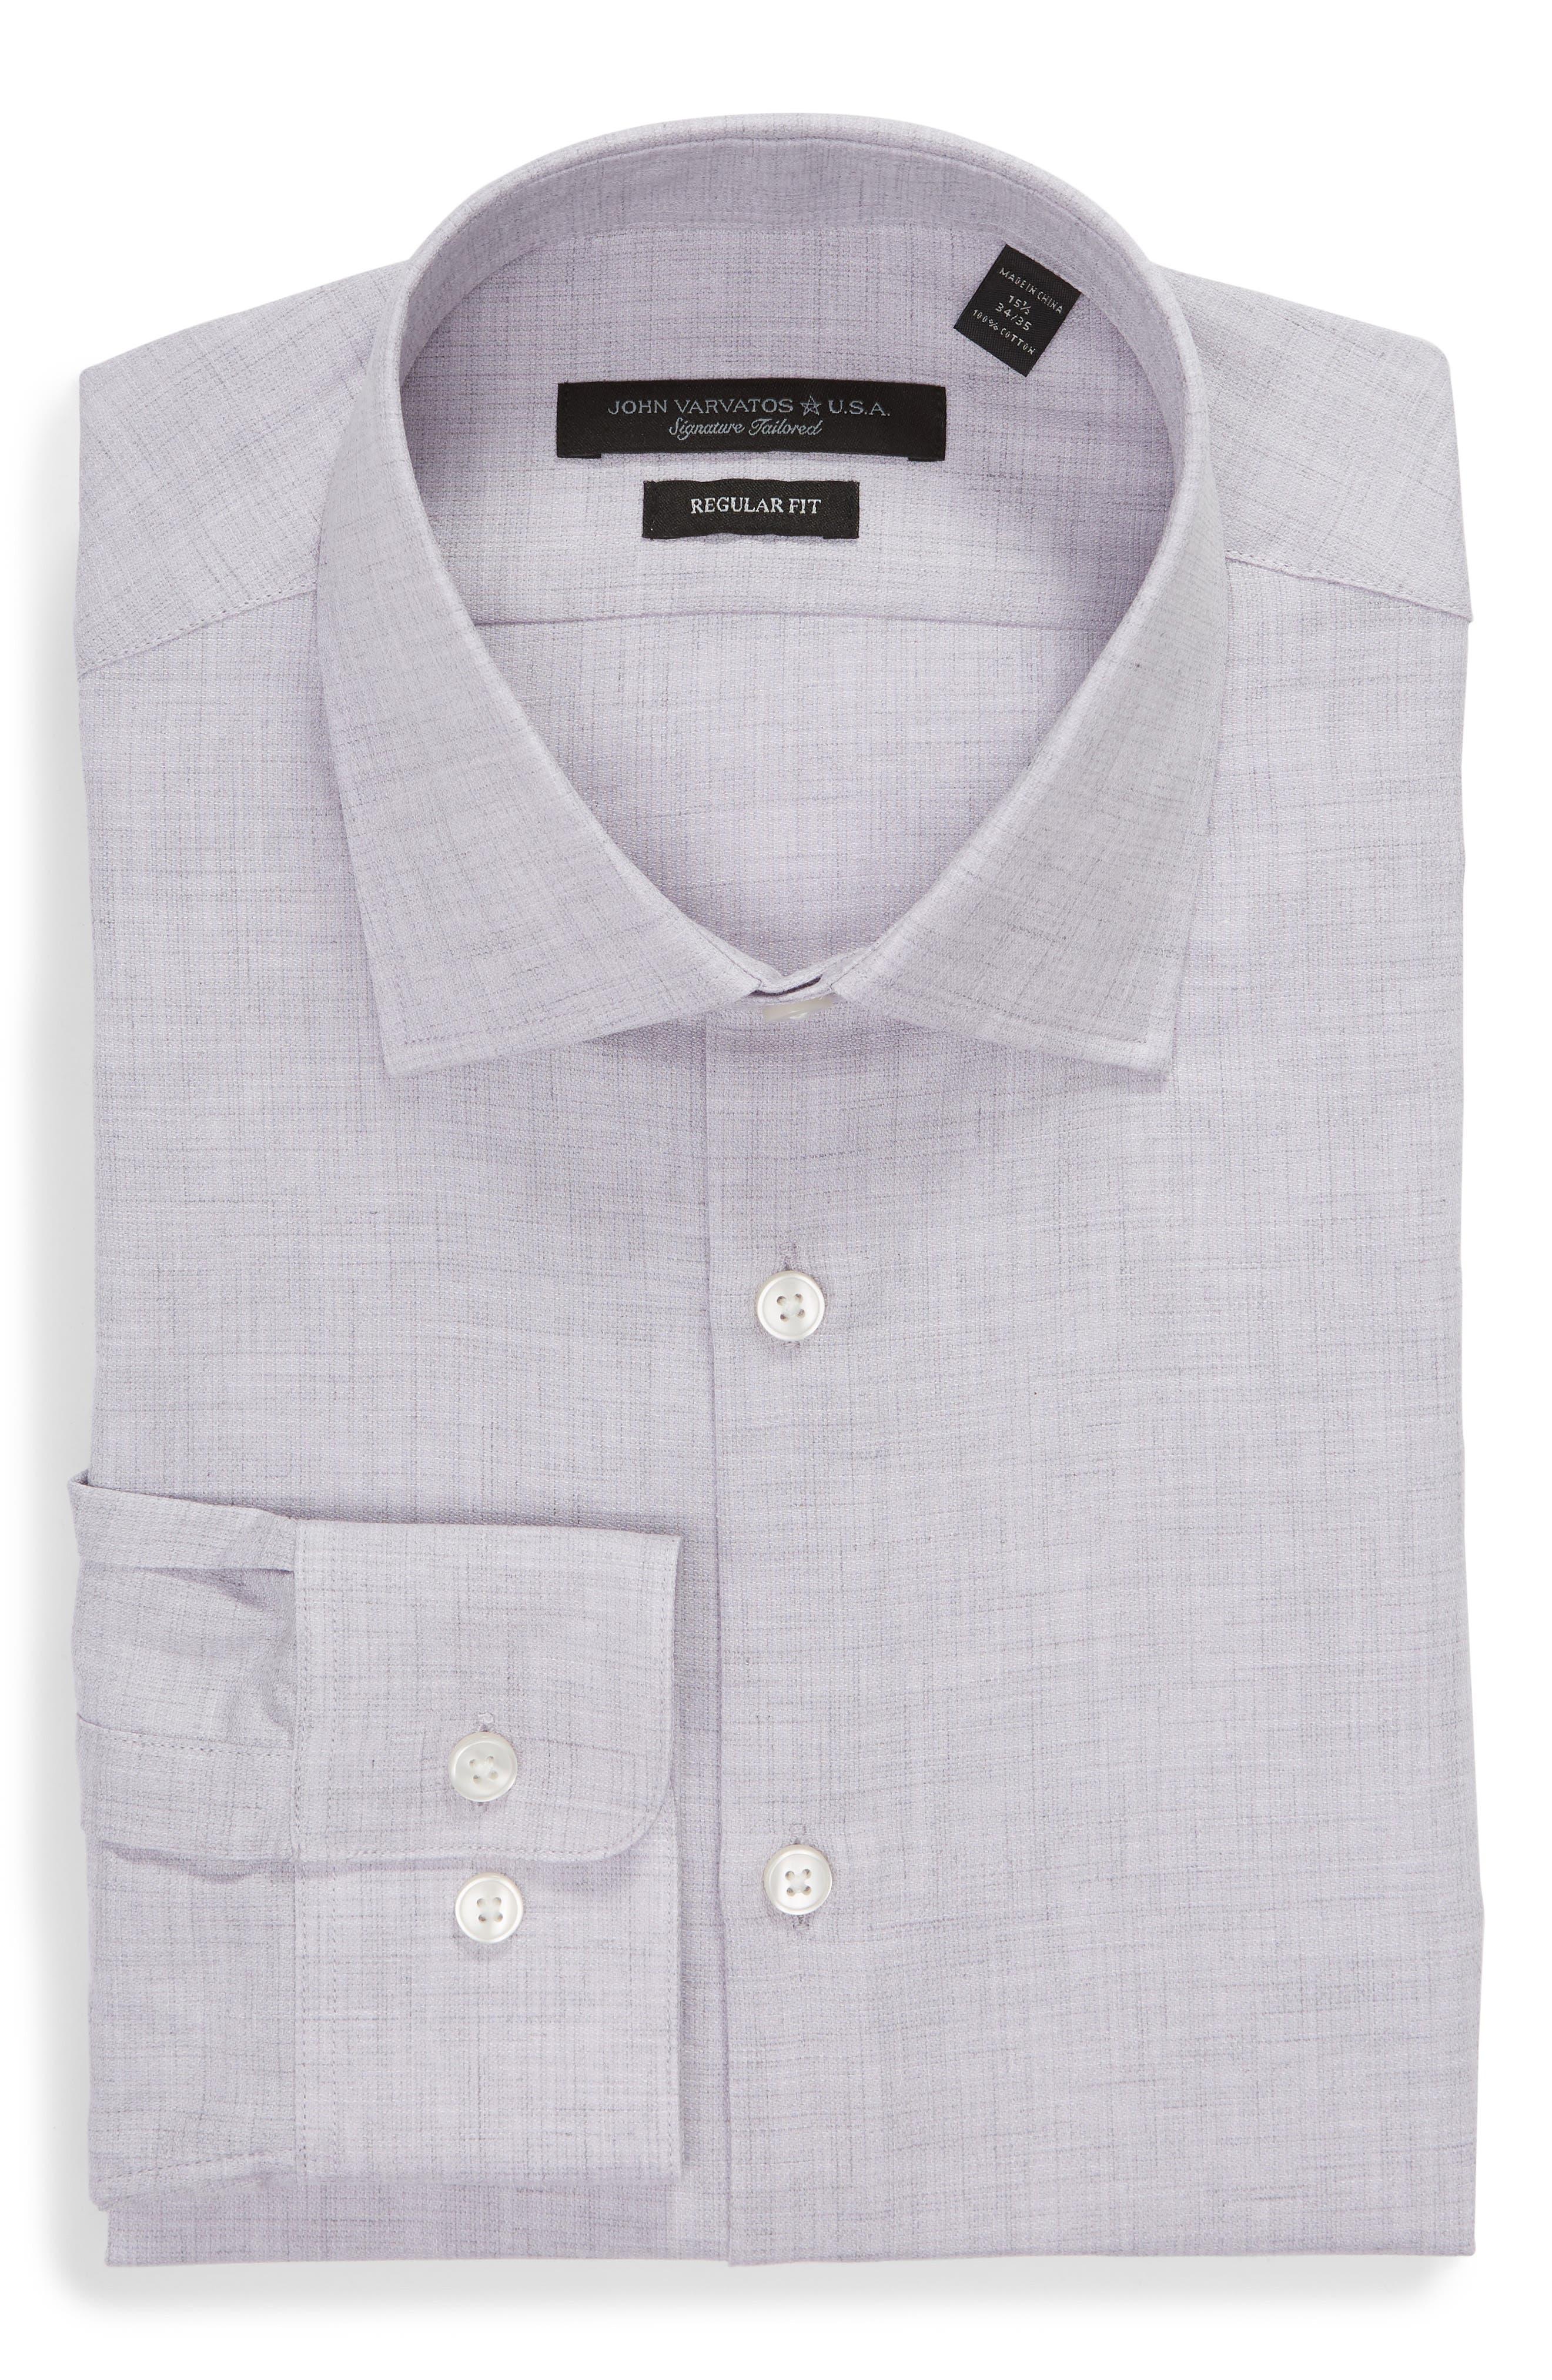 Regular Fit Solid Dress Shirt,                             Alternate thumbnail 5, color,                             HYDRANGEA